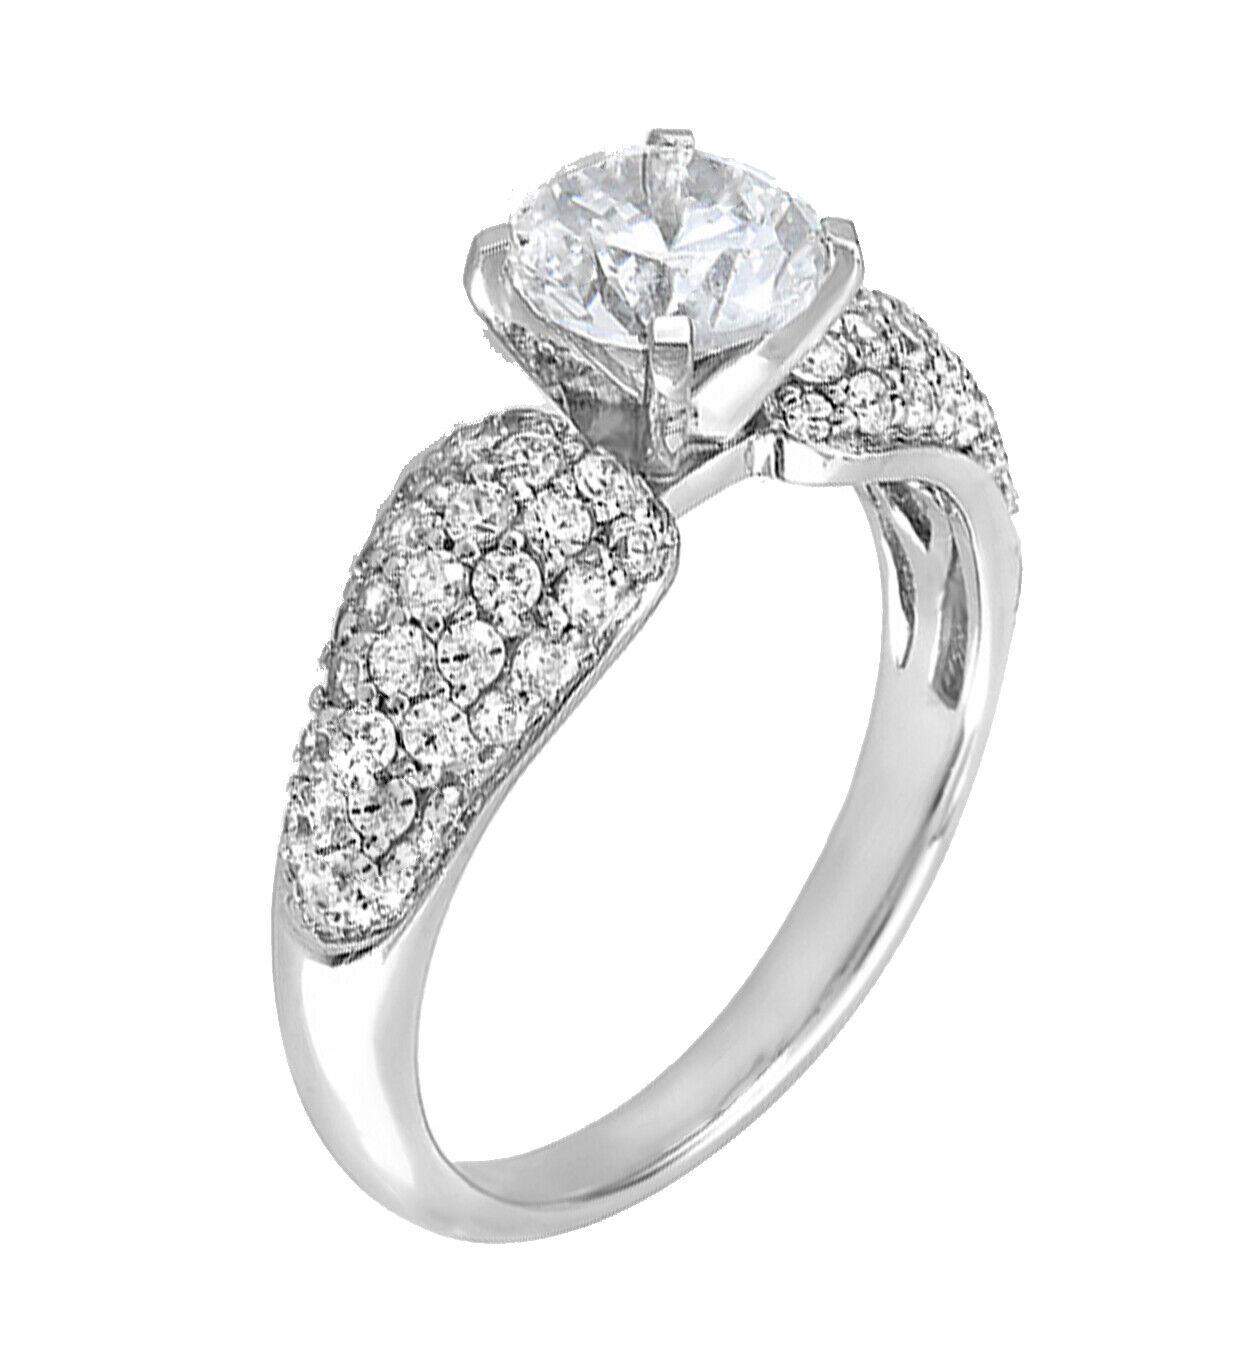 GIA Certified Round Diamond Engagement Ring 18k White Gold 1.81 Carat total 1